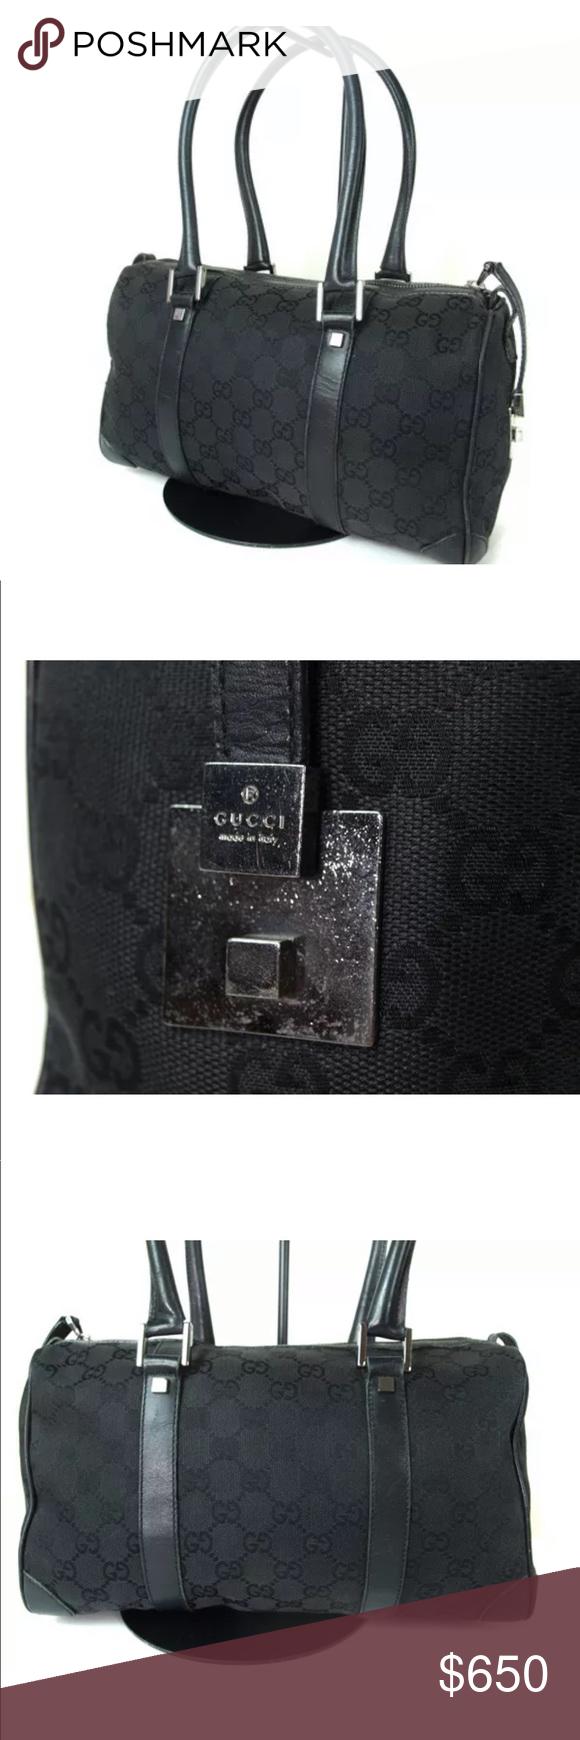 7914211cddd Gucci Bag Black canvas Signature monogram Leather trim Silver hardware Gucci  Bags Shoulder Bags